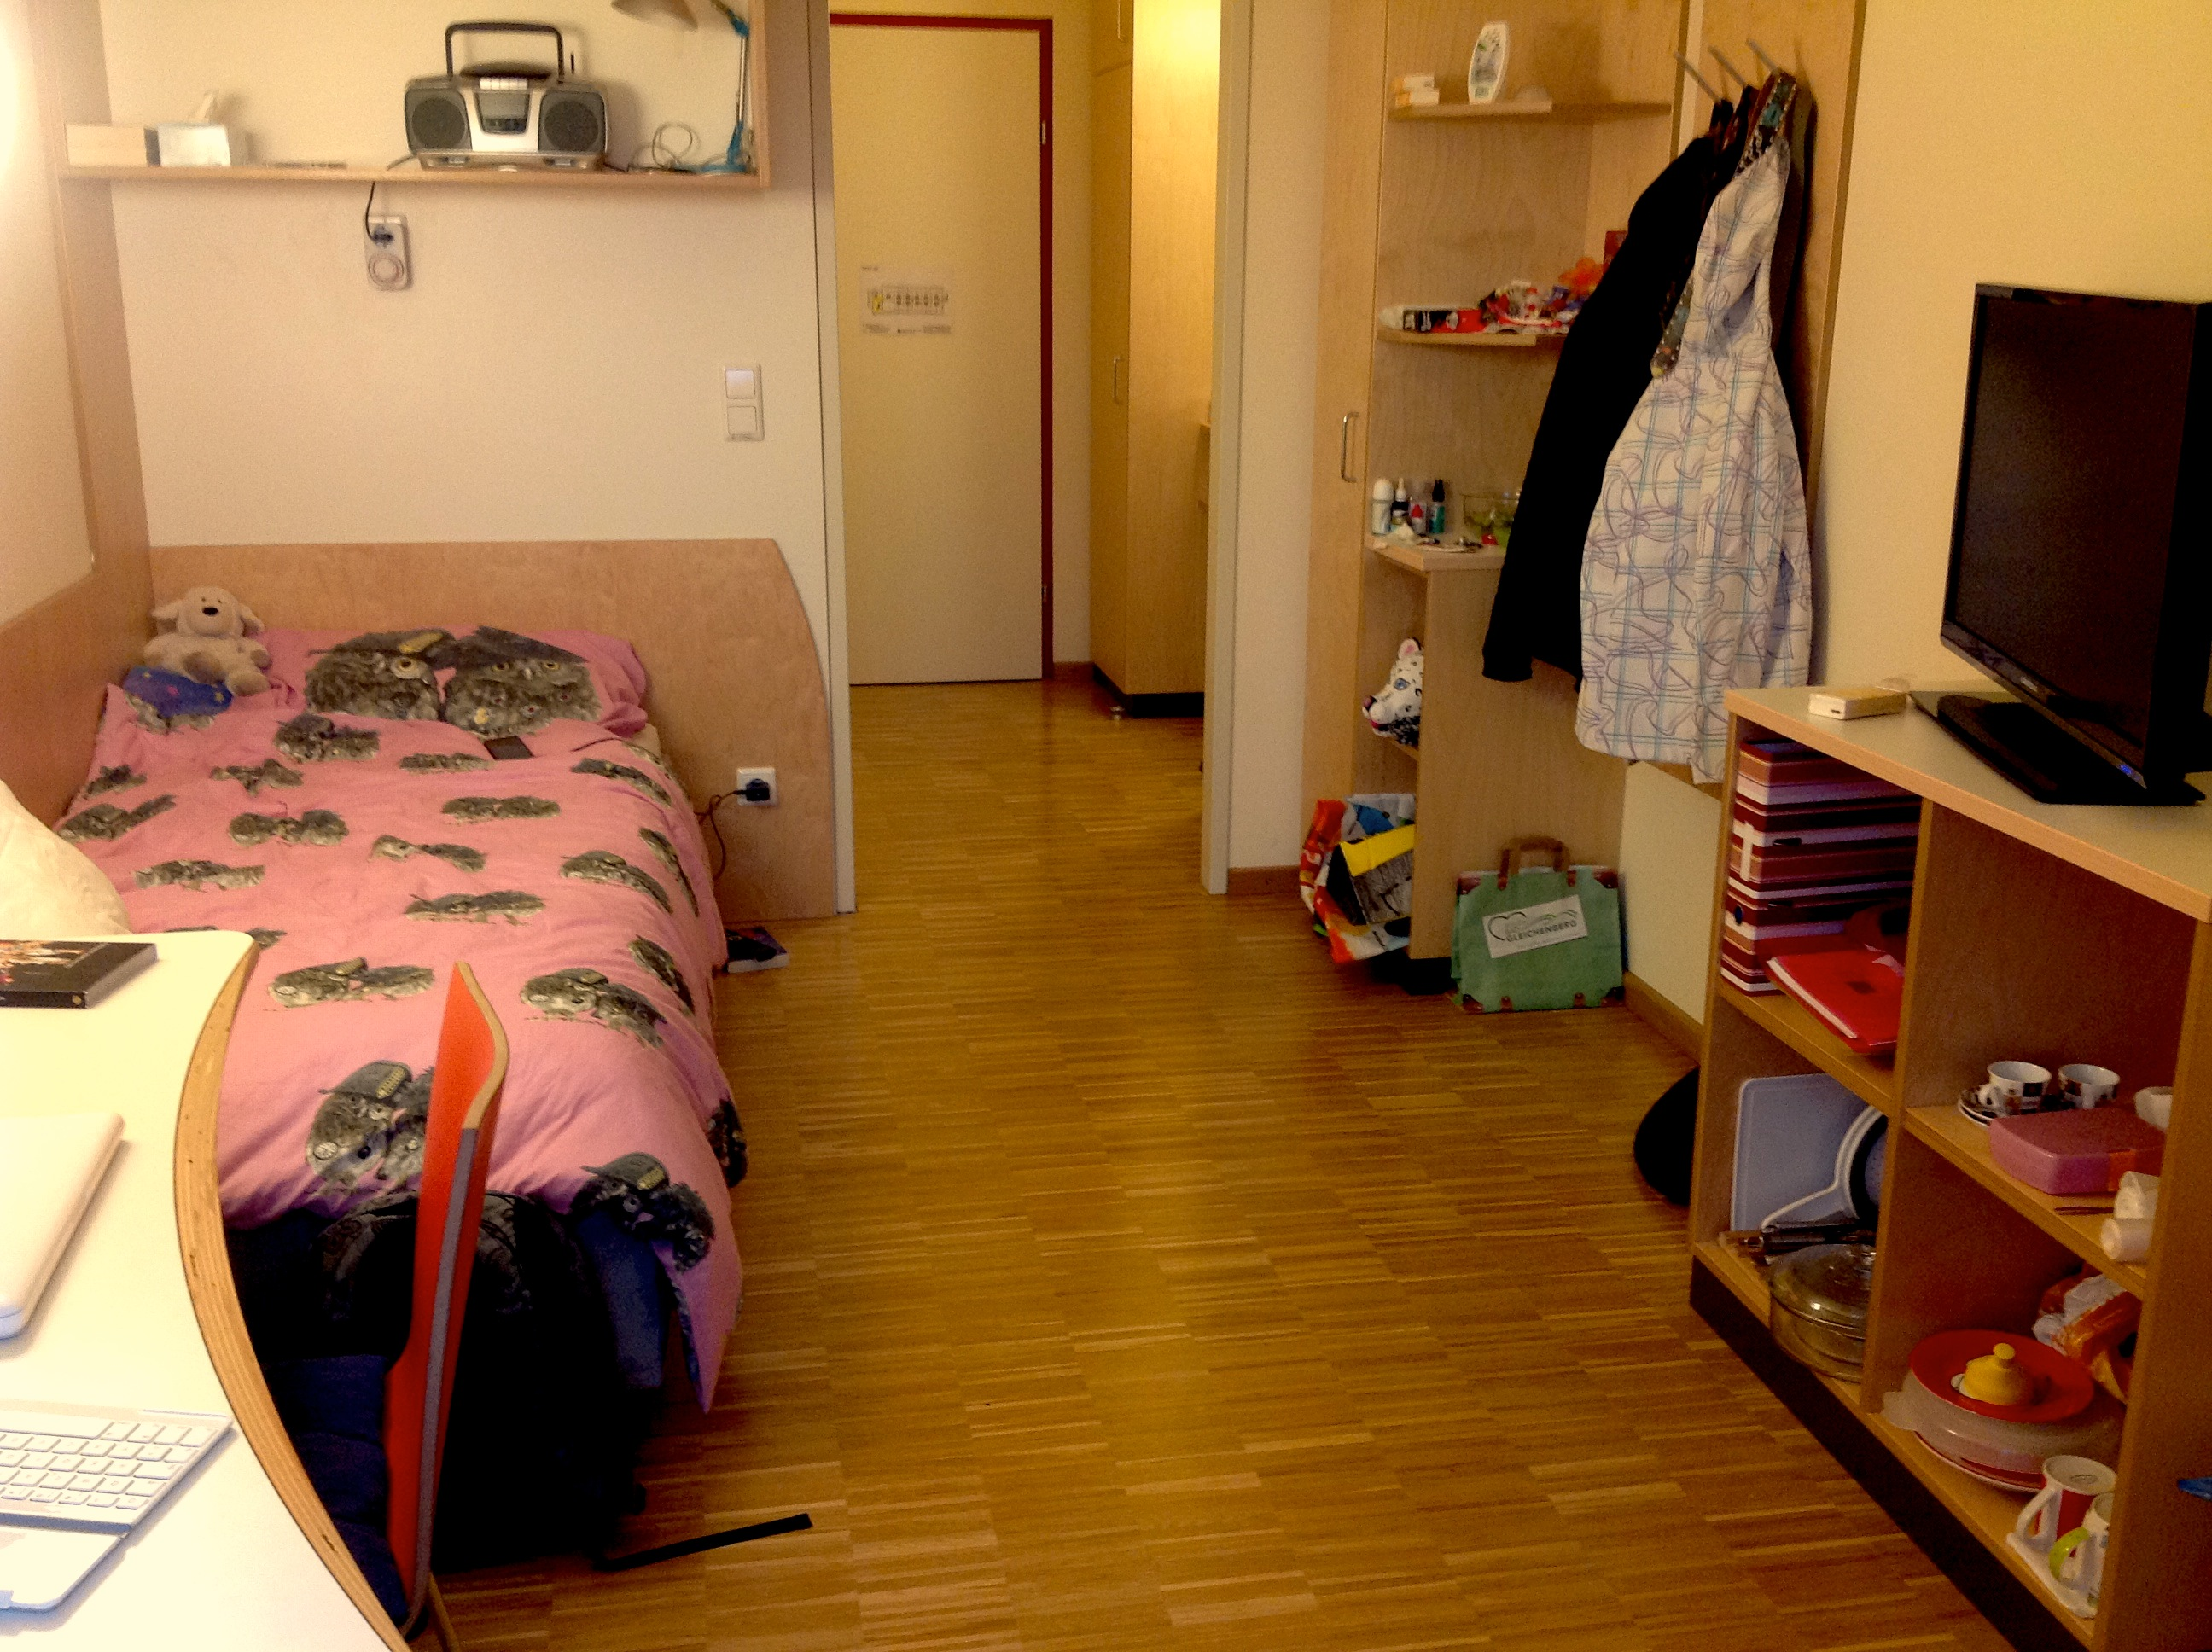 studentenleben kroko615s life. Black Bedroom Furniture Sets. Home Design Ideas